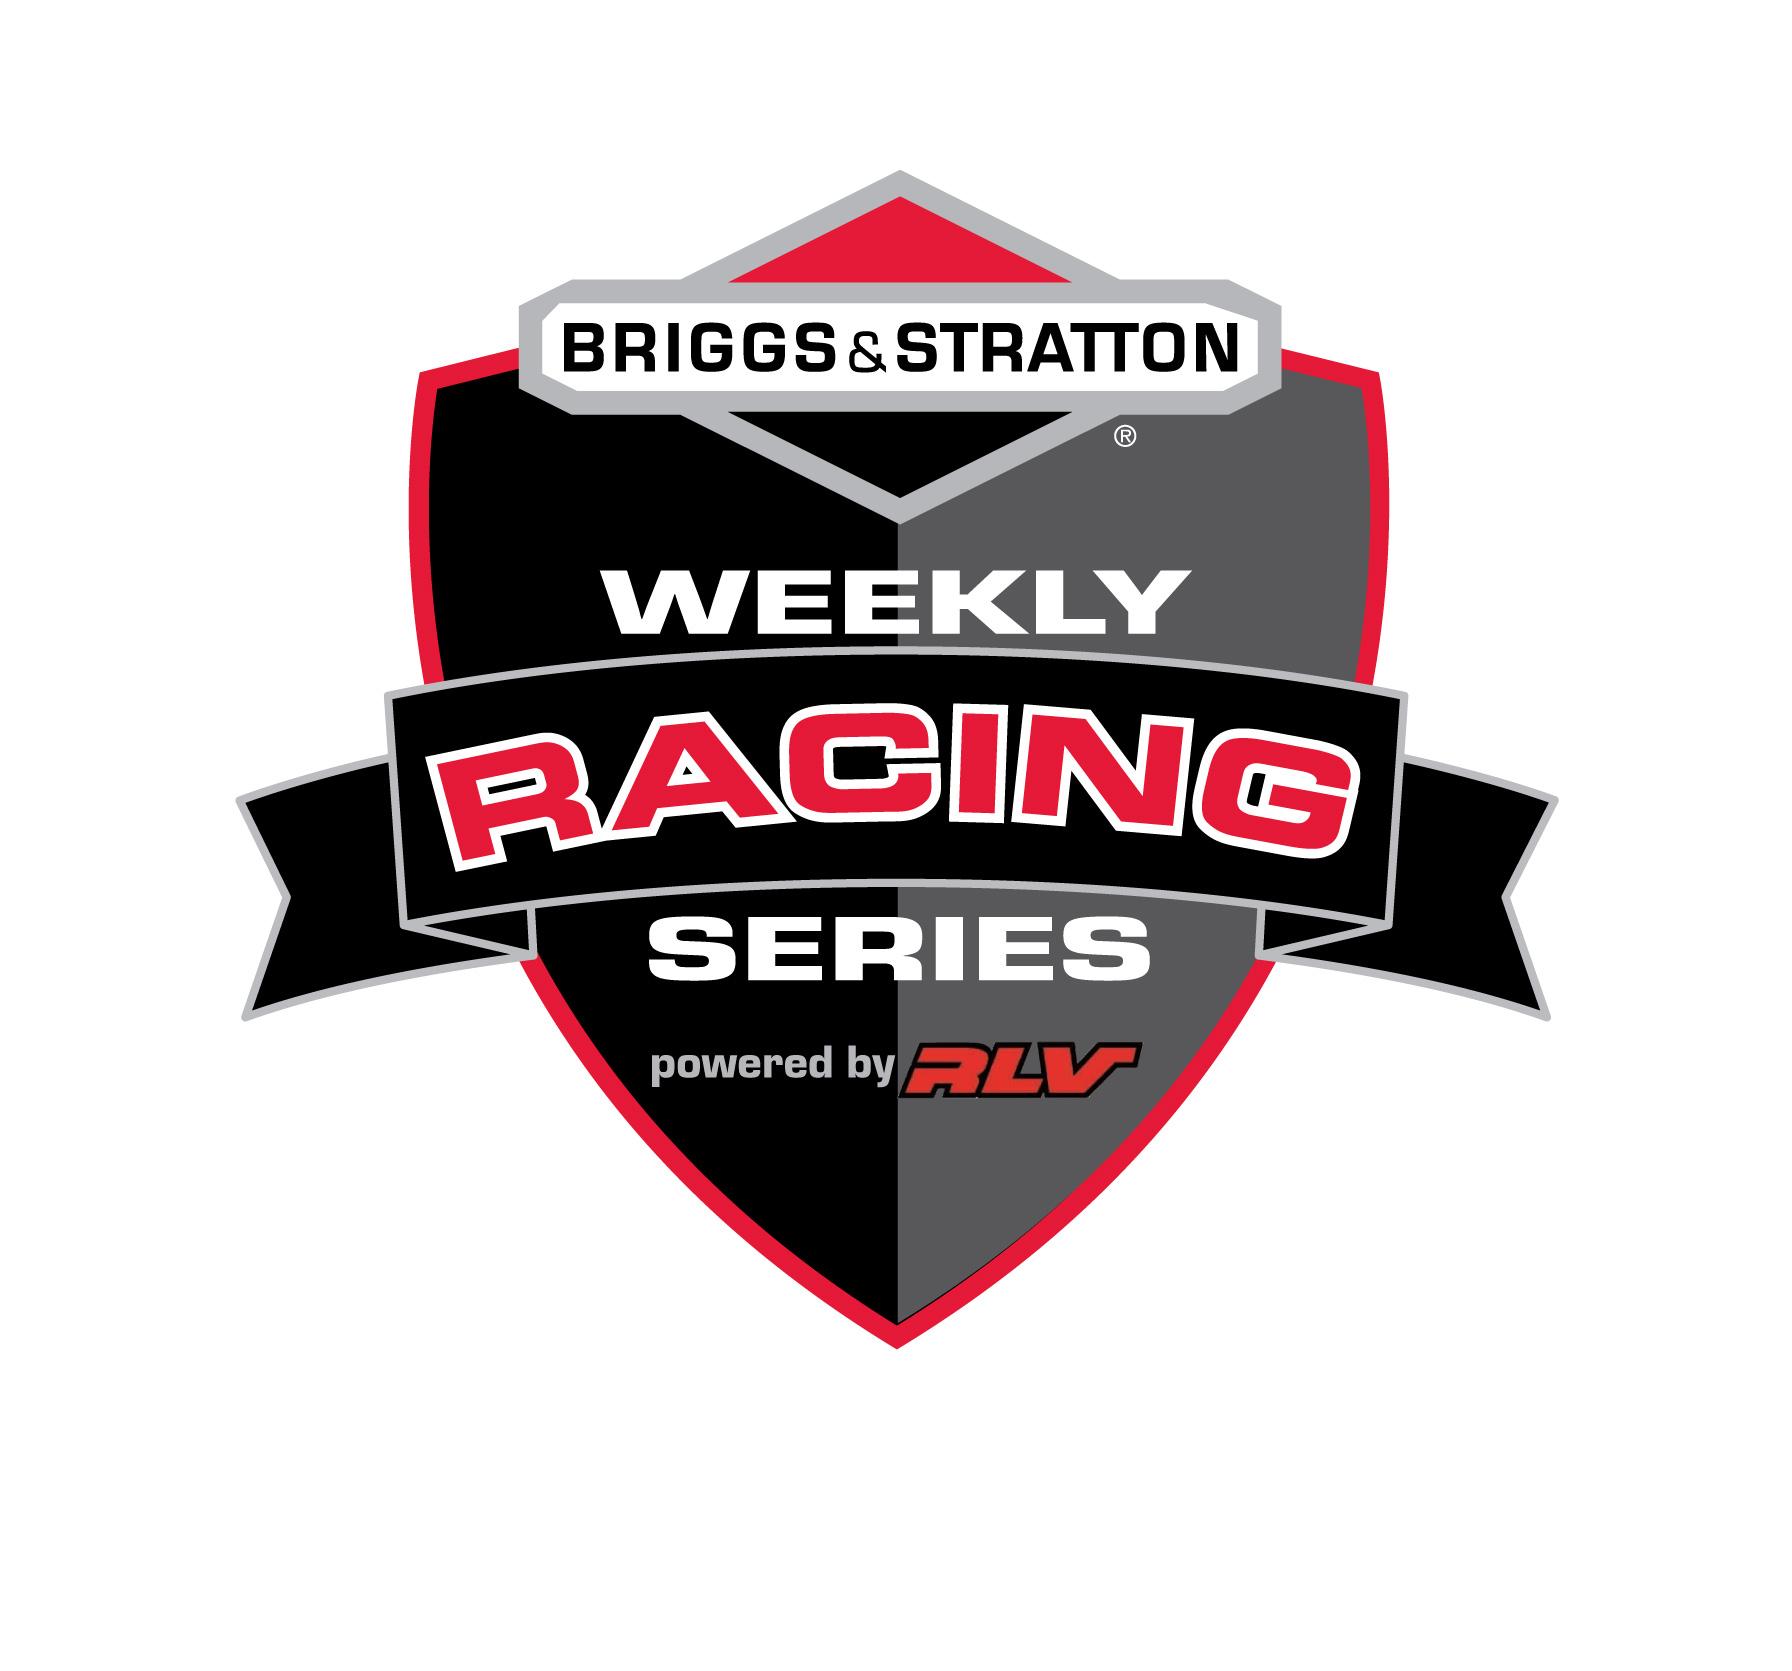 04 19 2016 - Deadline Extension - The Briggs & Stratton